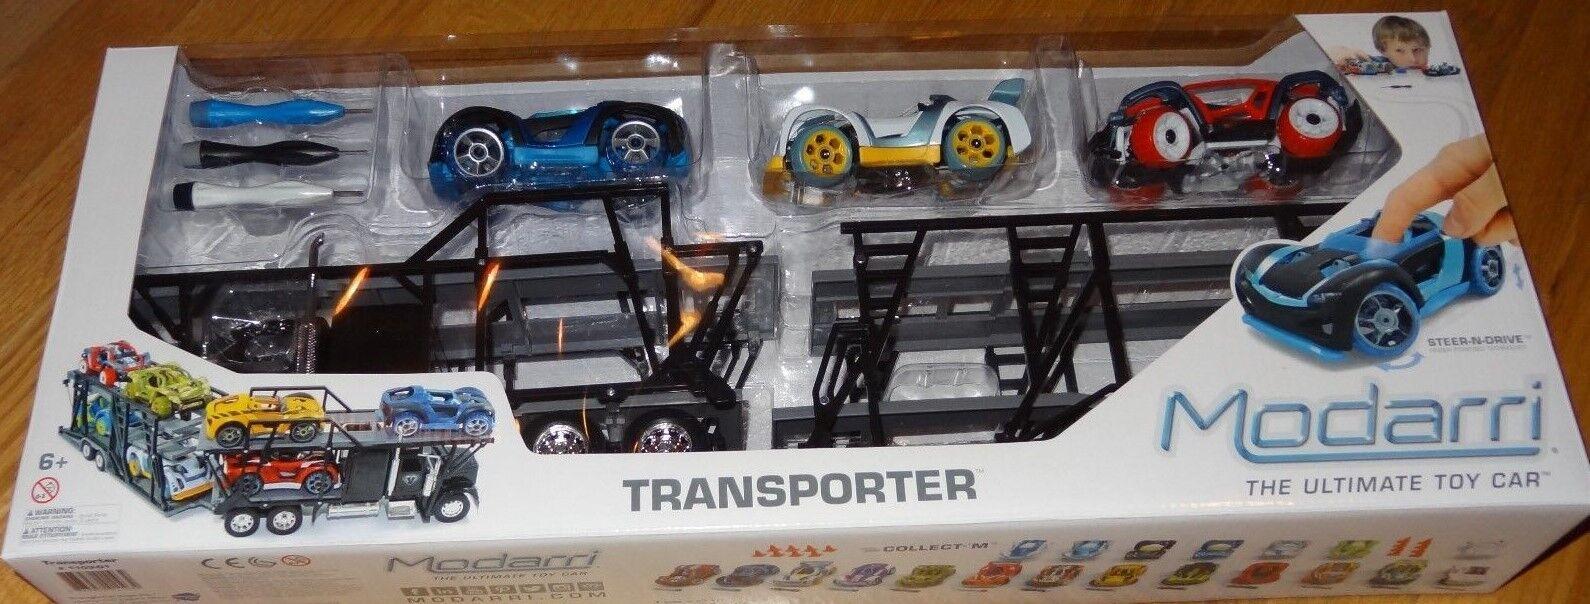 Transporter Modarri Car Carrier with 3 cars Design, Build, Drive Finger Powerosso